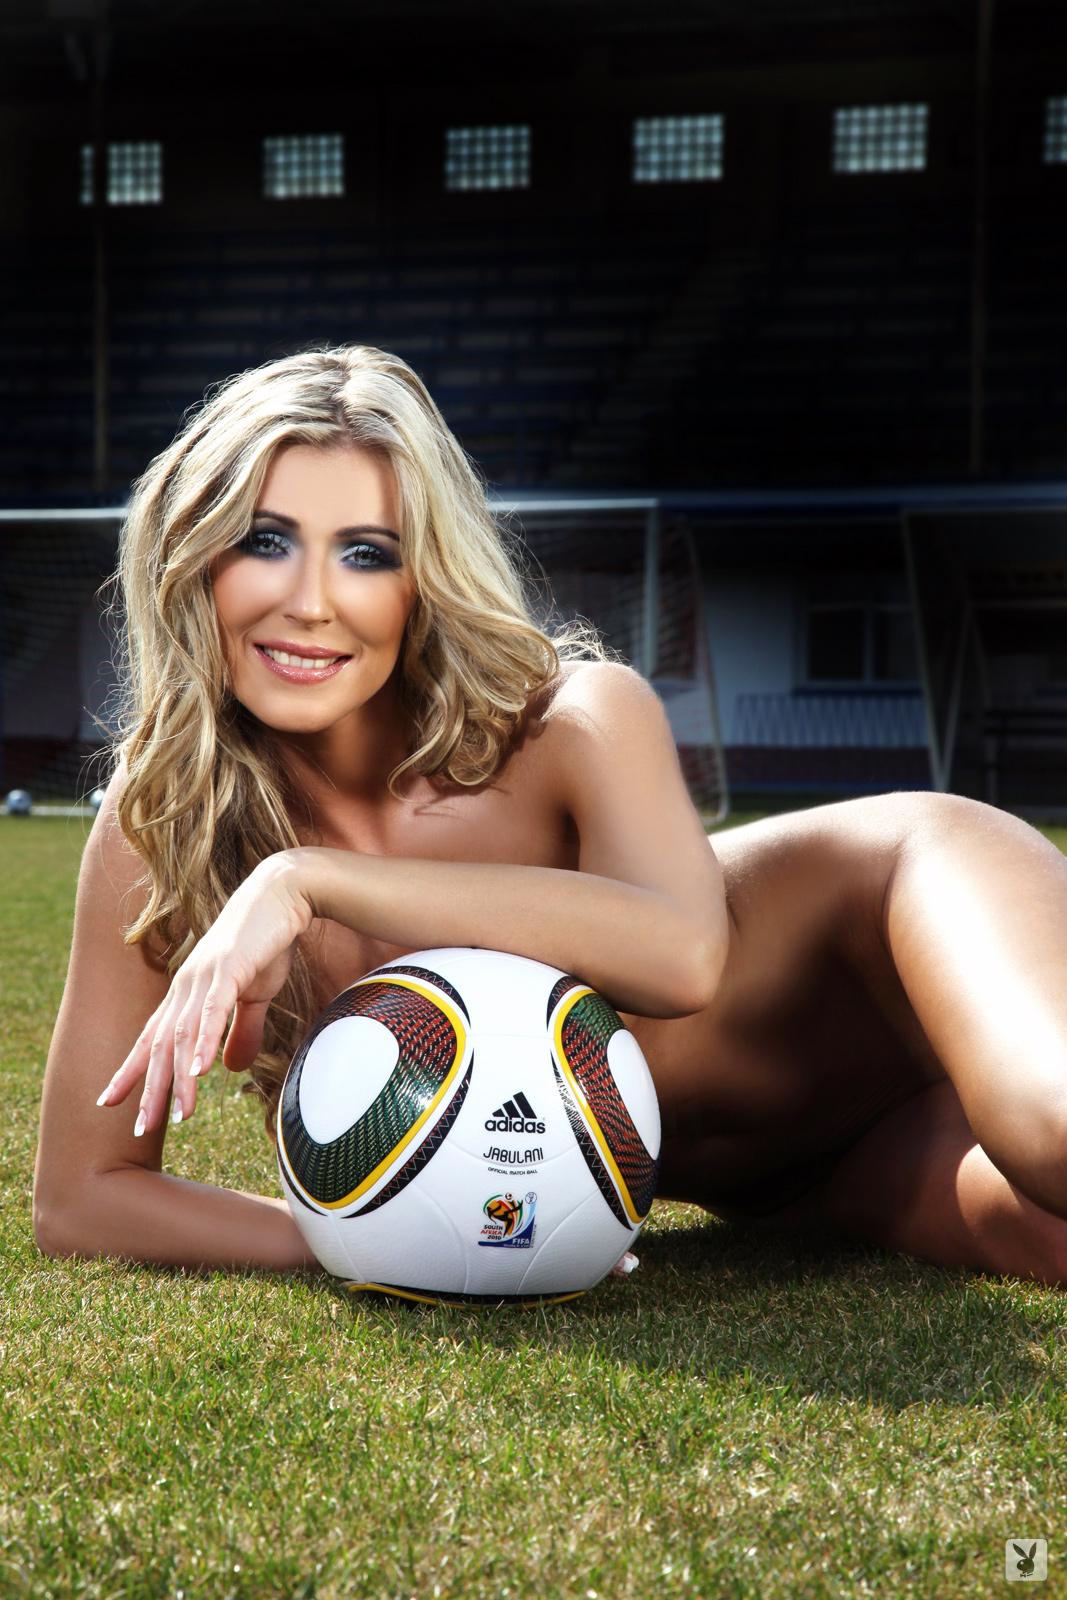 football women hot nude